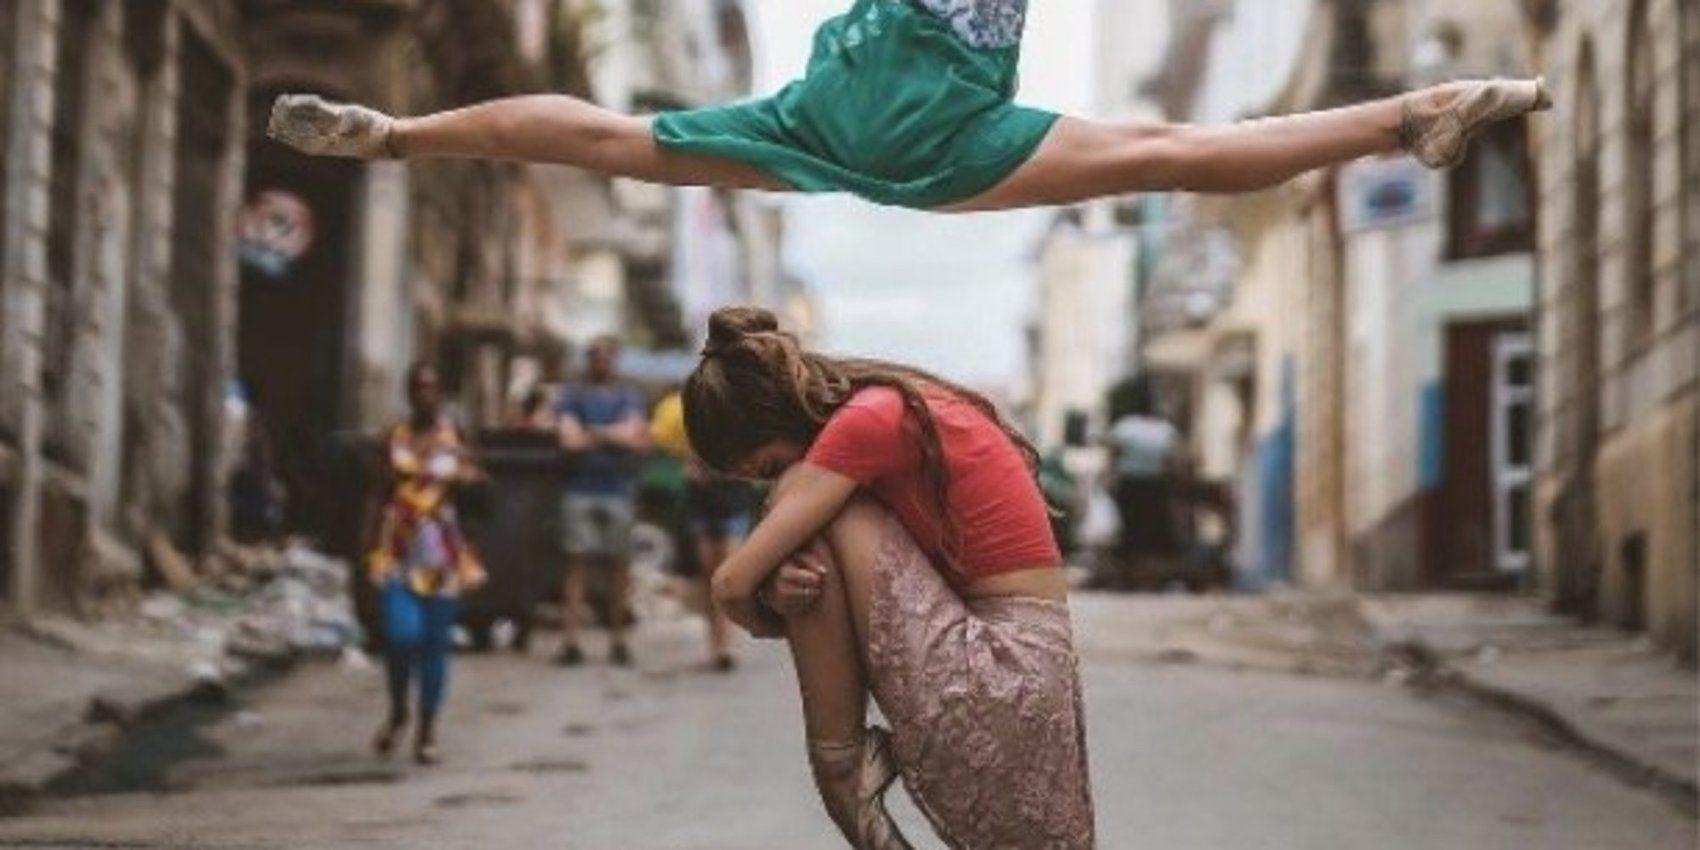 Breathtaking photos capture cubas legendary ballerinas